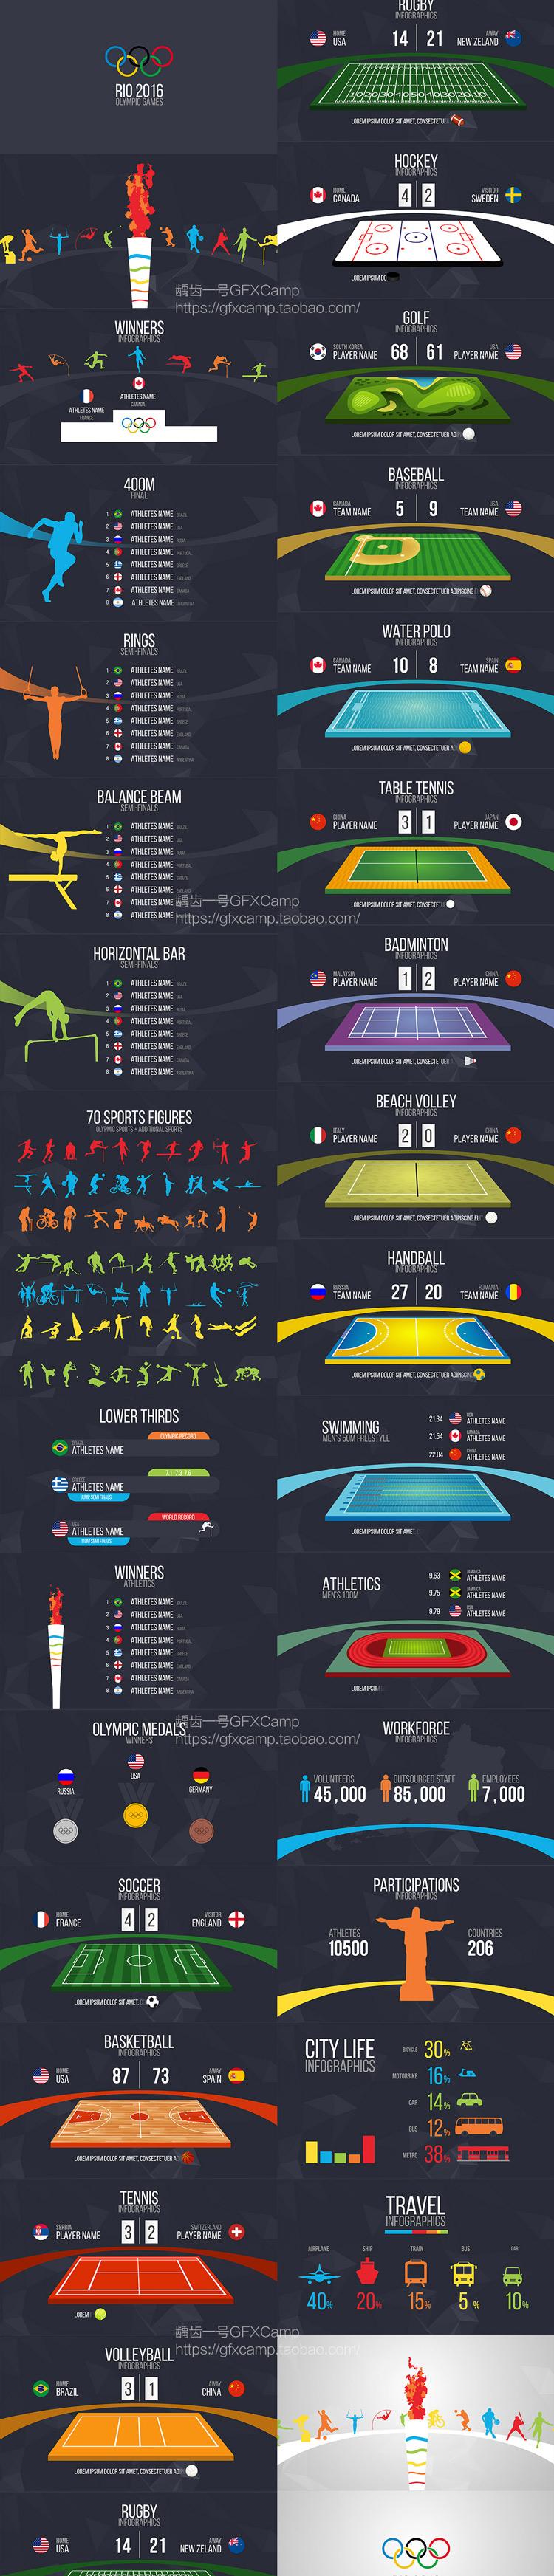 AE模板-体育奥运会人物运动剪影赛事比分MG动画